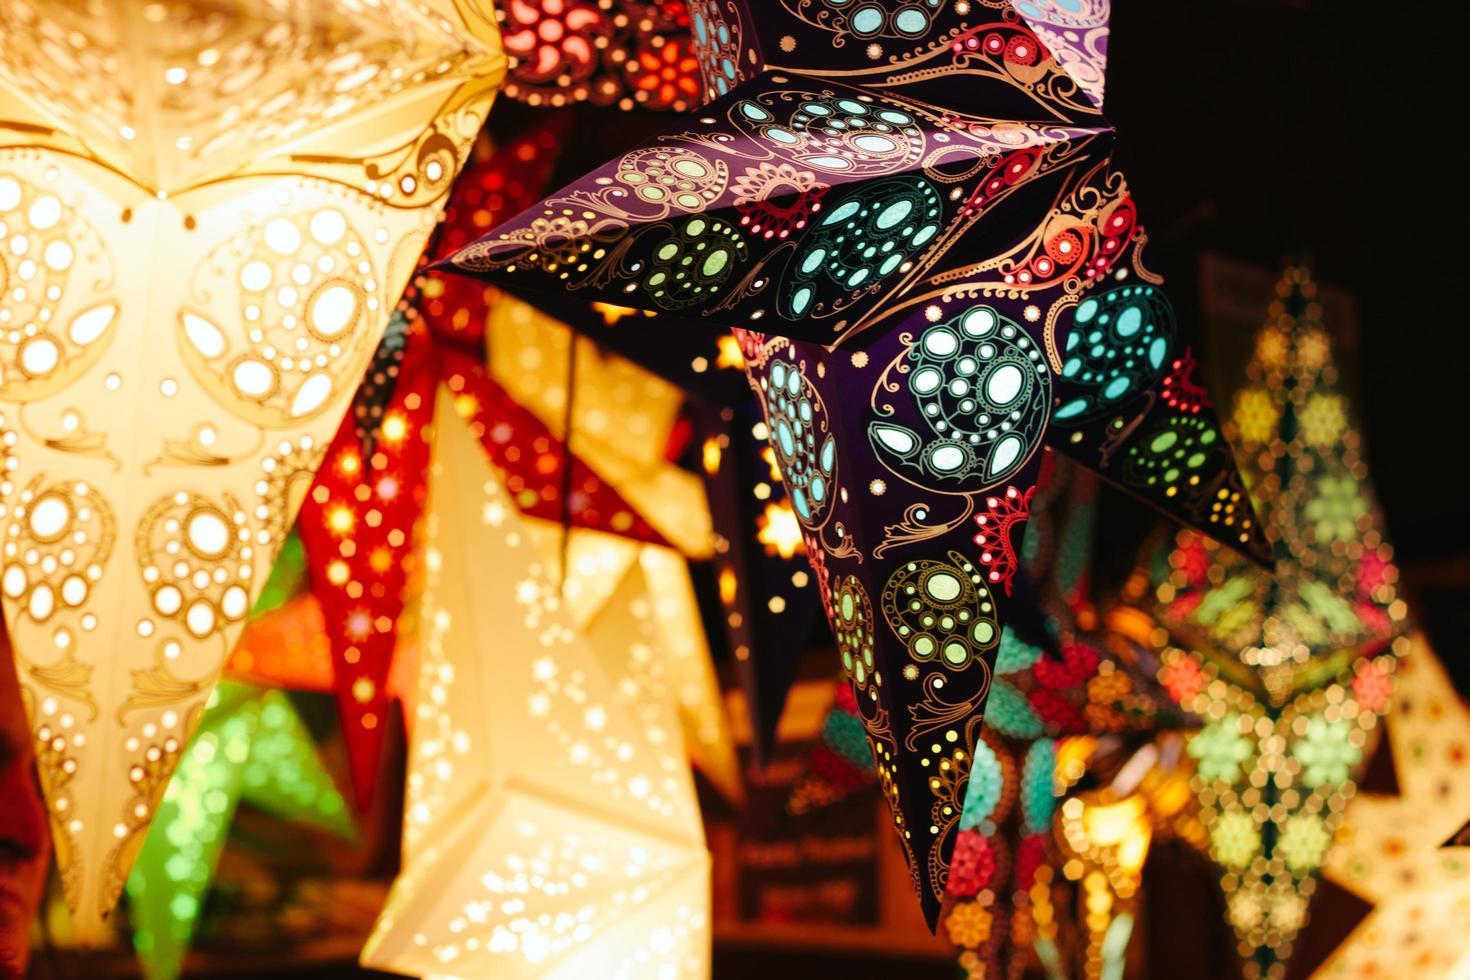 lanternes multicolores illuminées photo